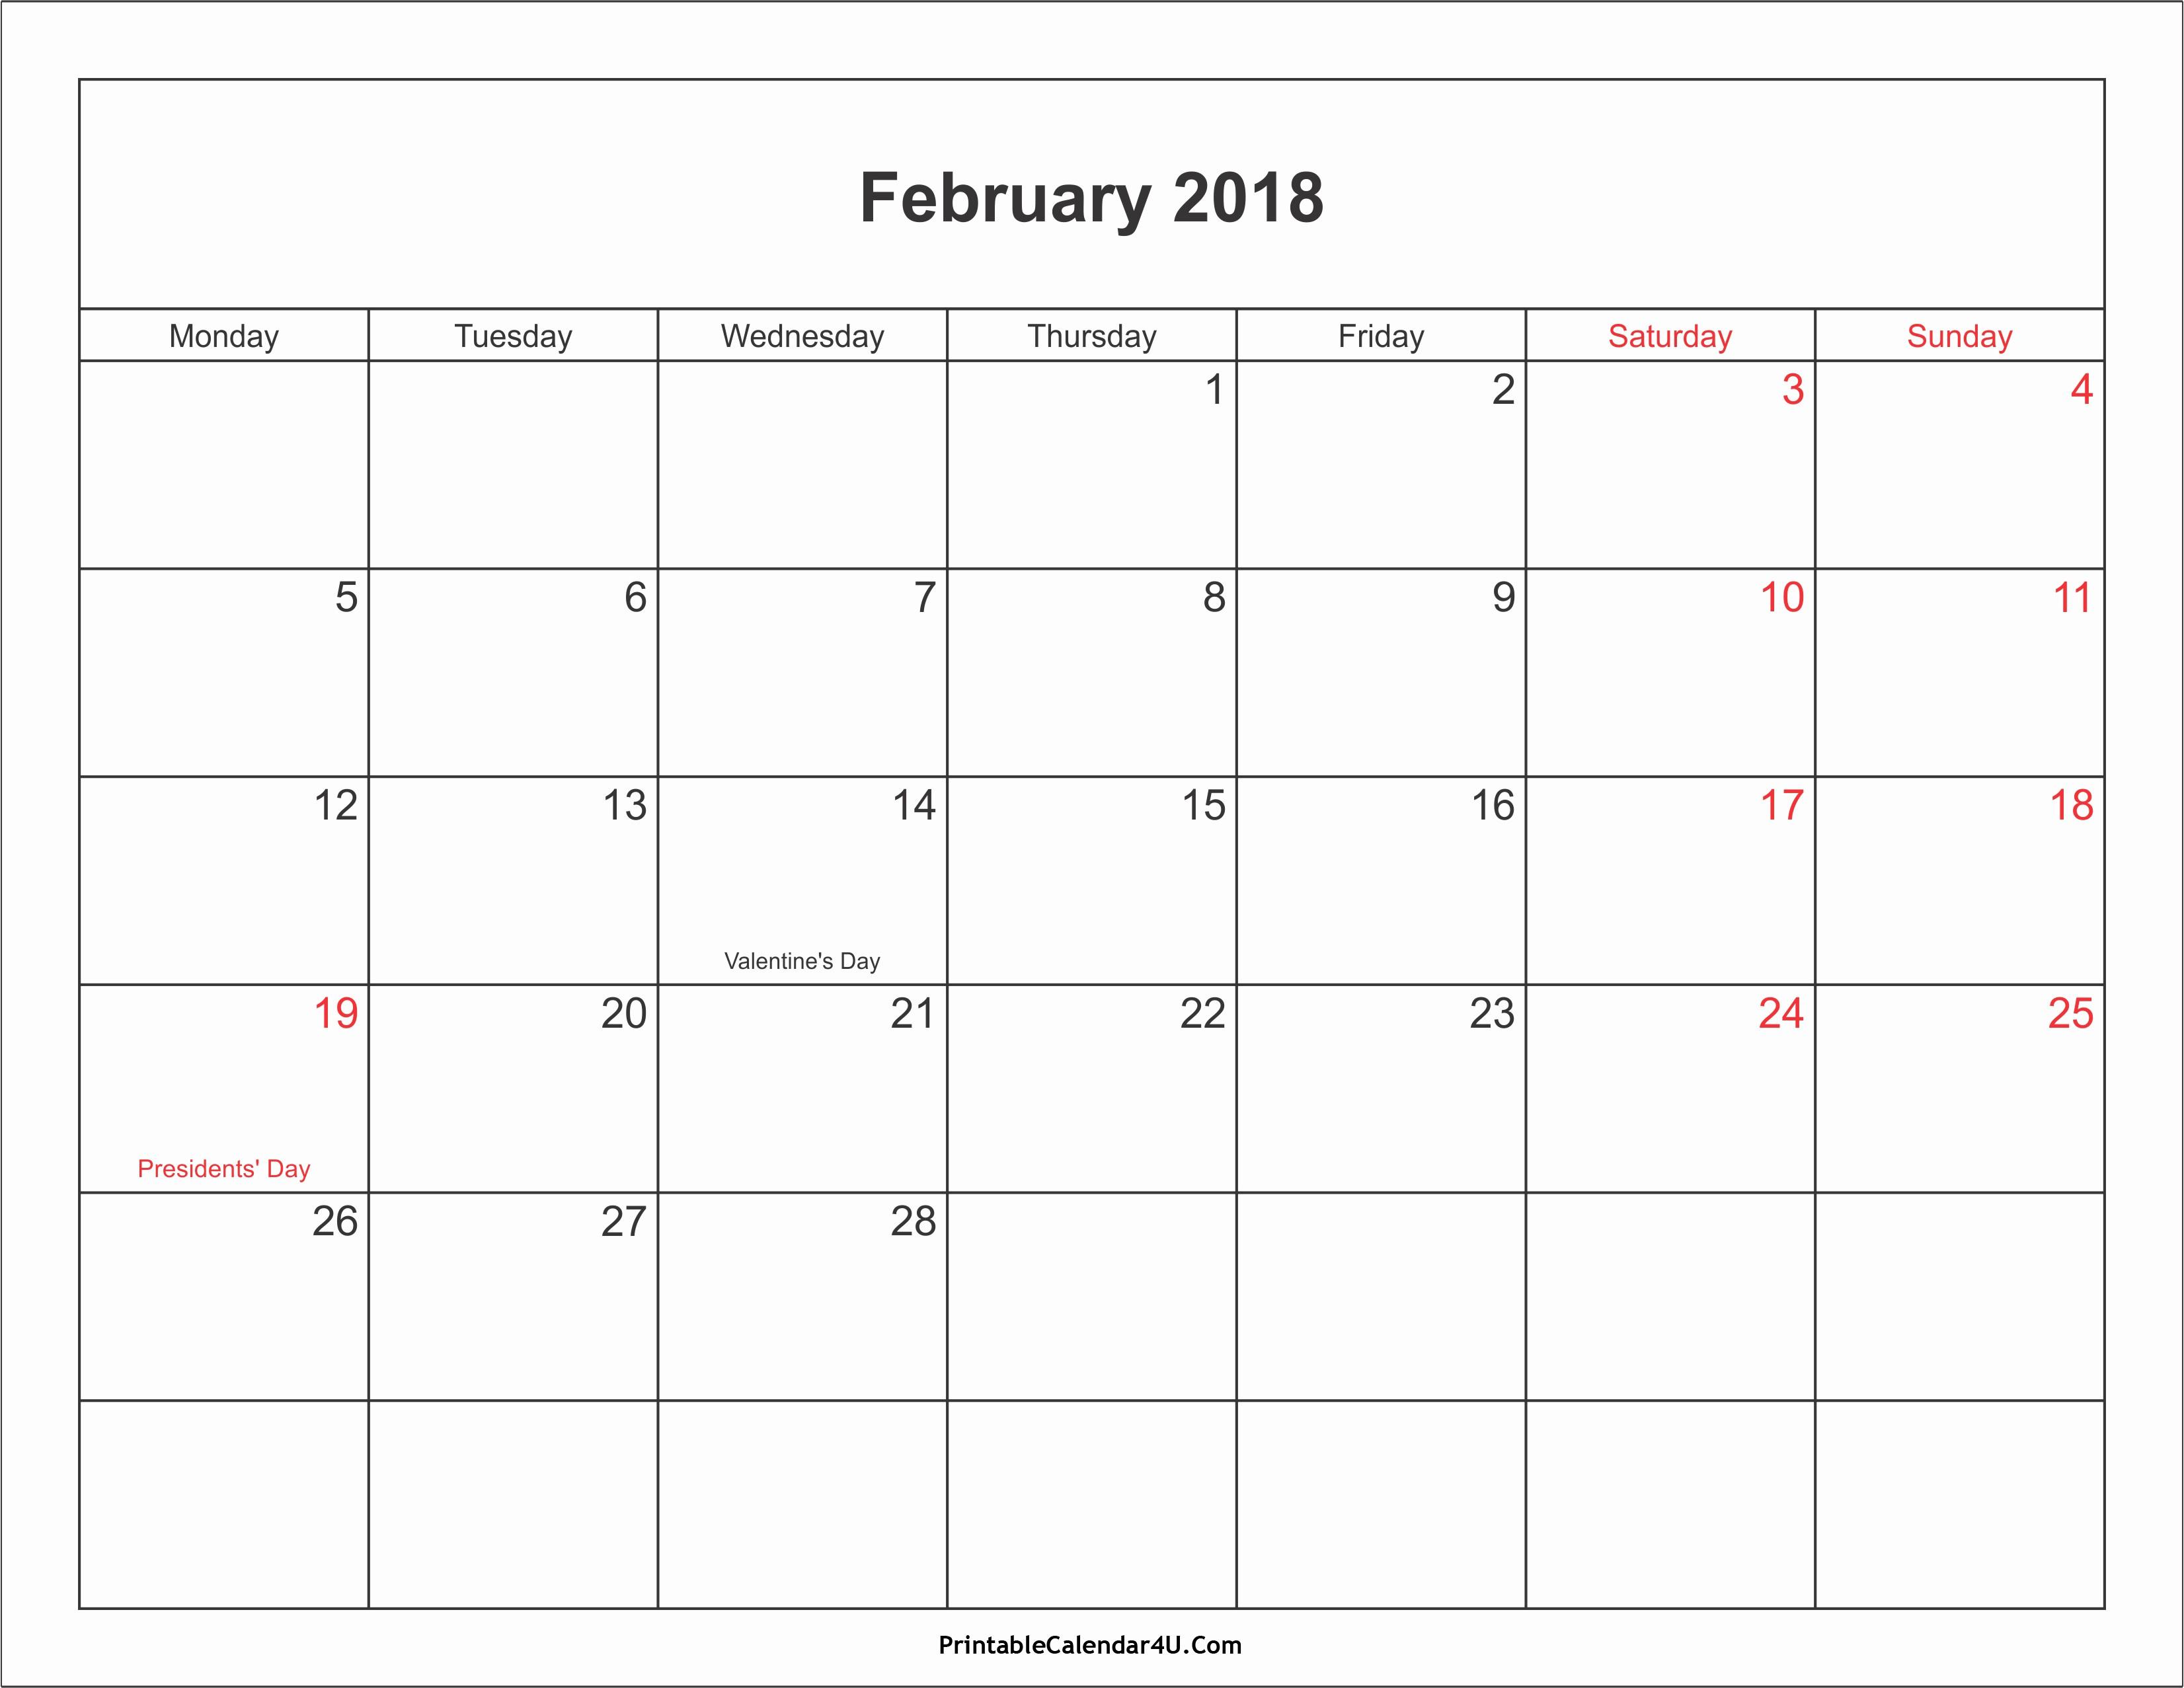 Calendar 2018 Printable with Holidays Luxury February 2018 Calendar with Holidays